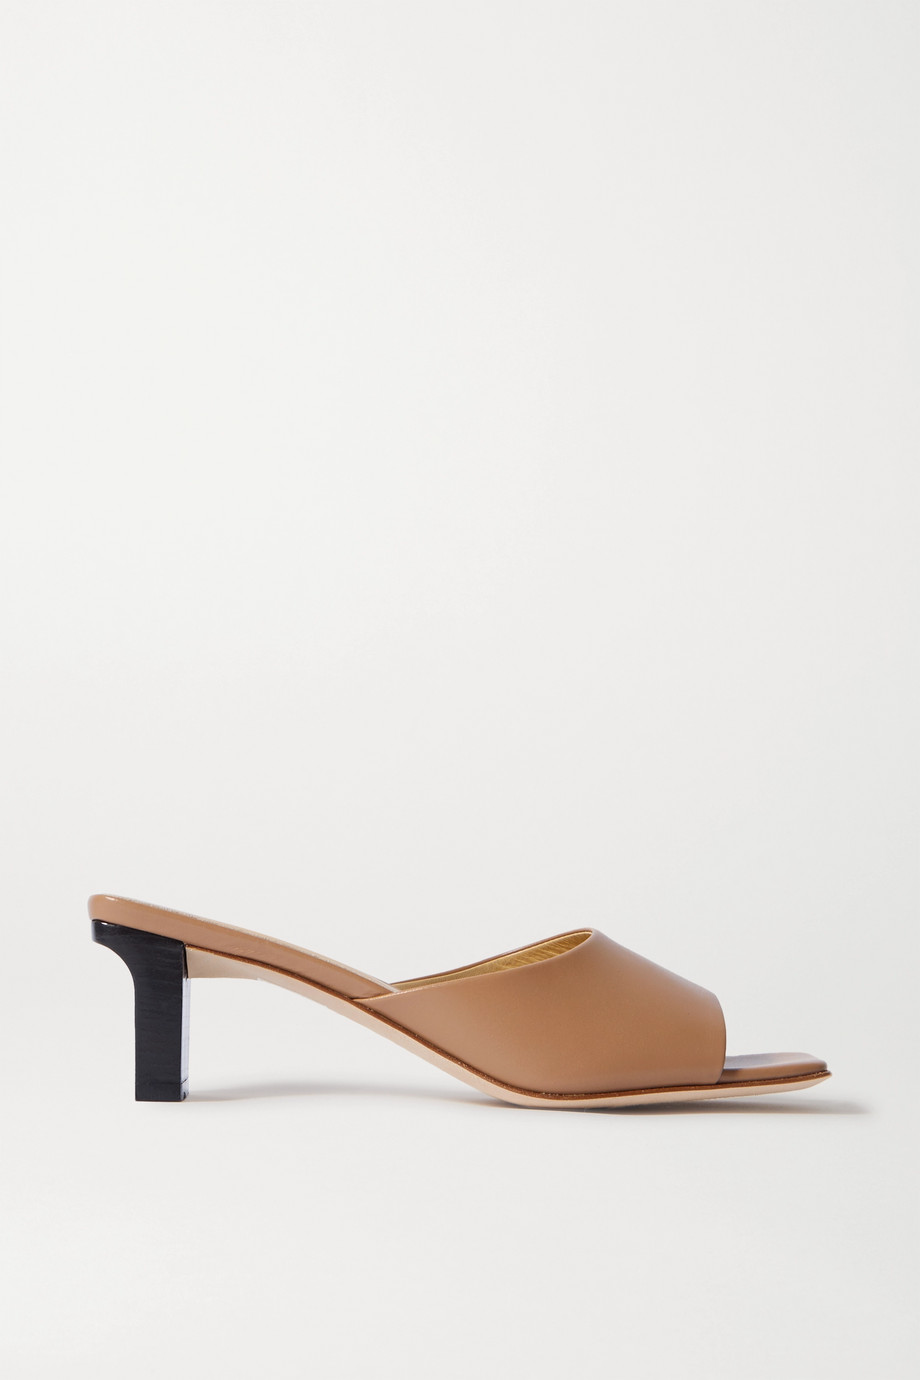 aeyde Katti leather mules